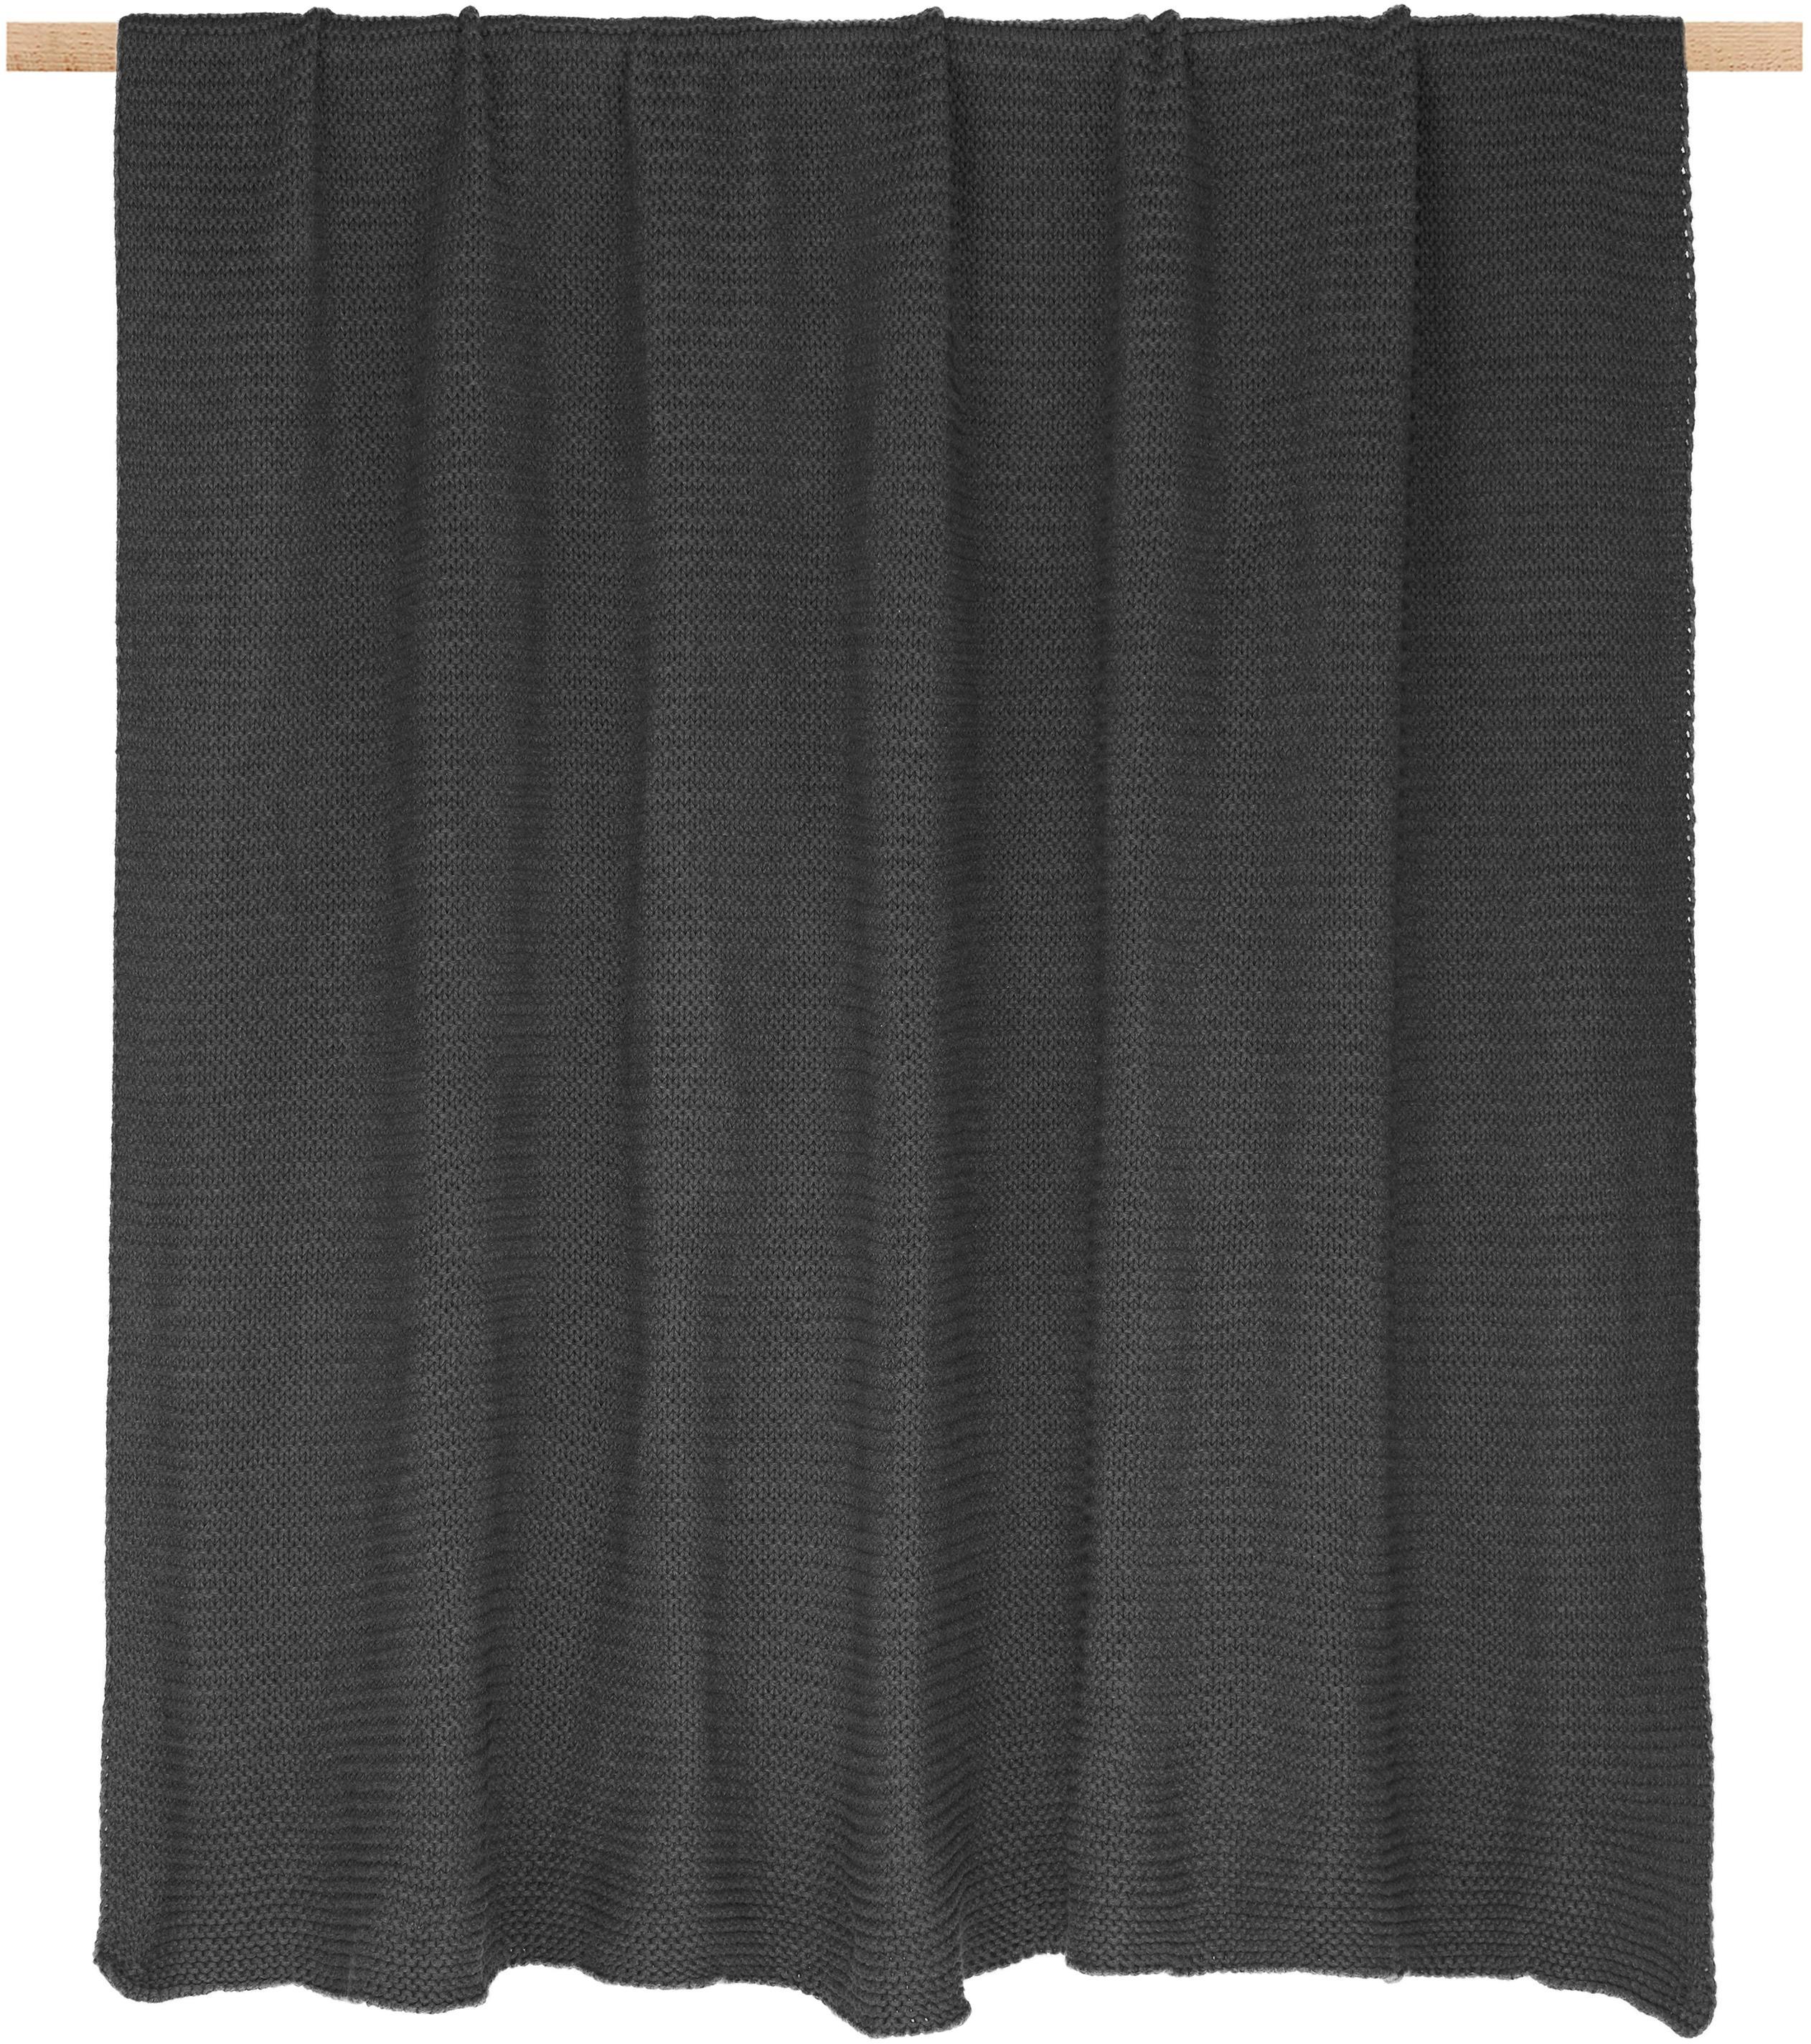 Strick-Plaid Adalyn, 100% Baumwolle, Dunkelgrau, 150 x 200 cm